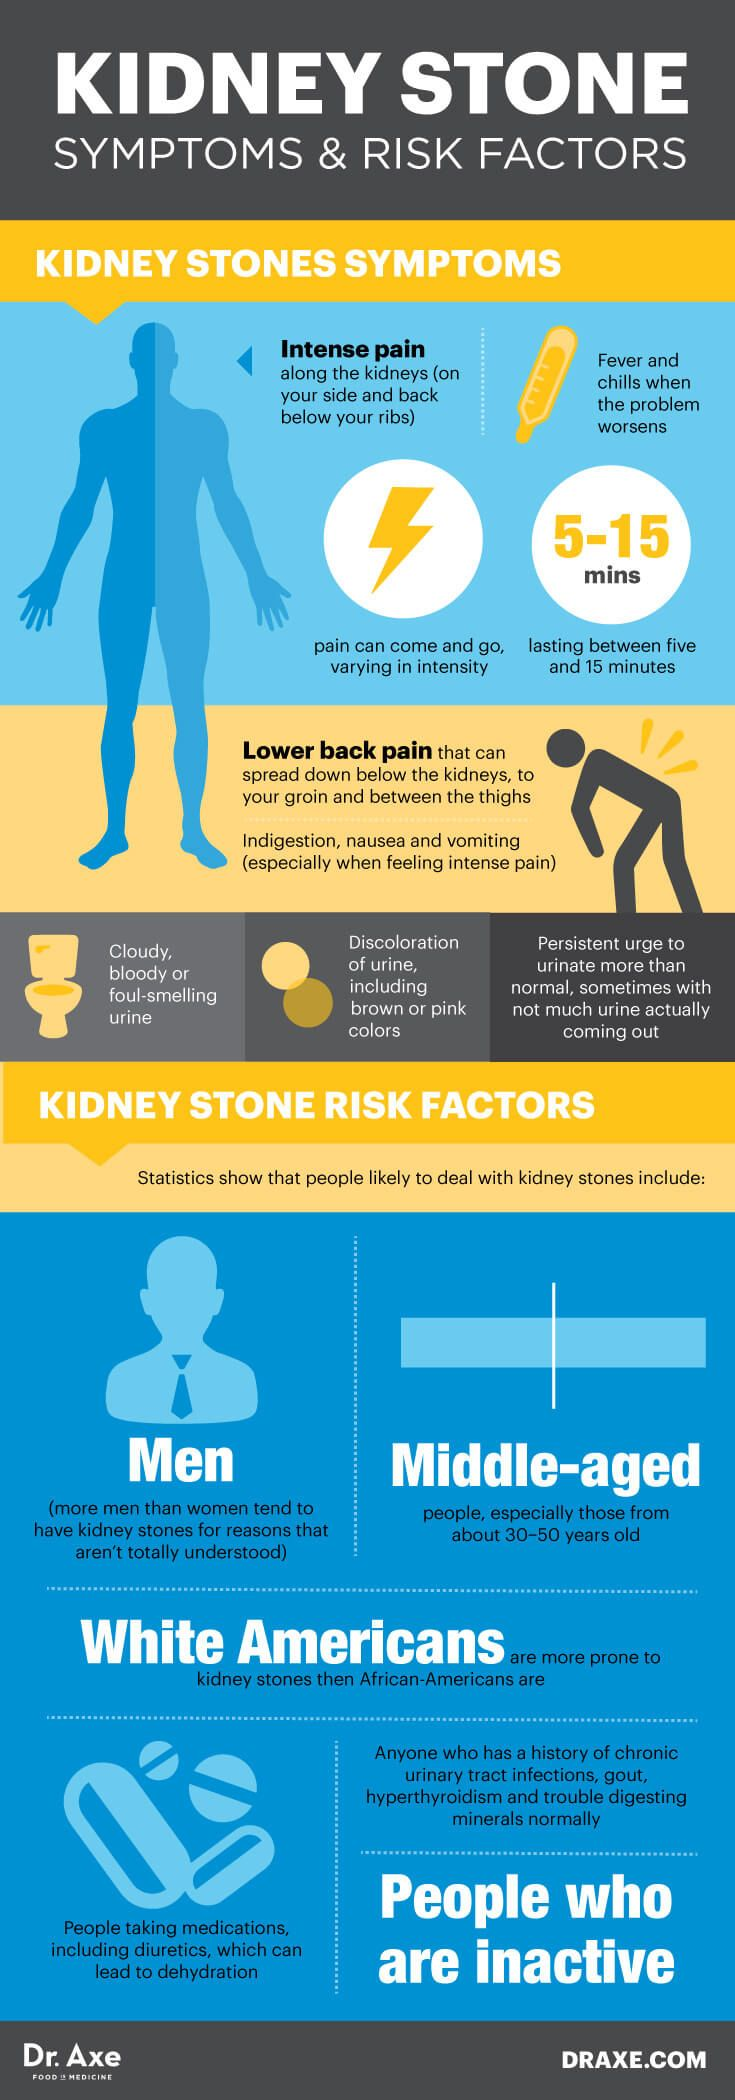 Kidney stone symptoms & risk factors - Dr. Axe http://www.draxe.com #health #holistic #natural